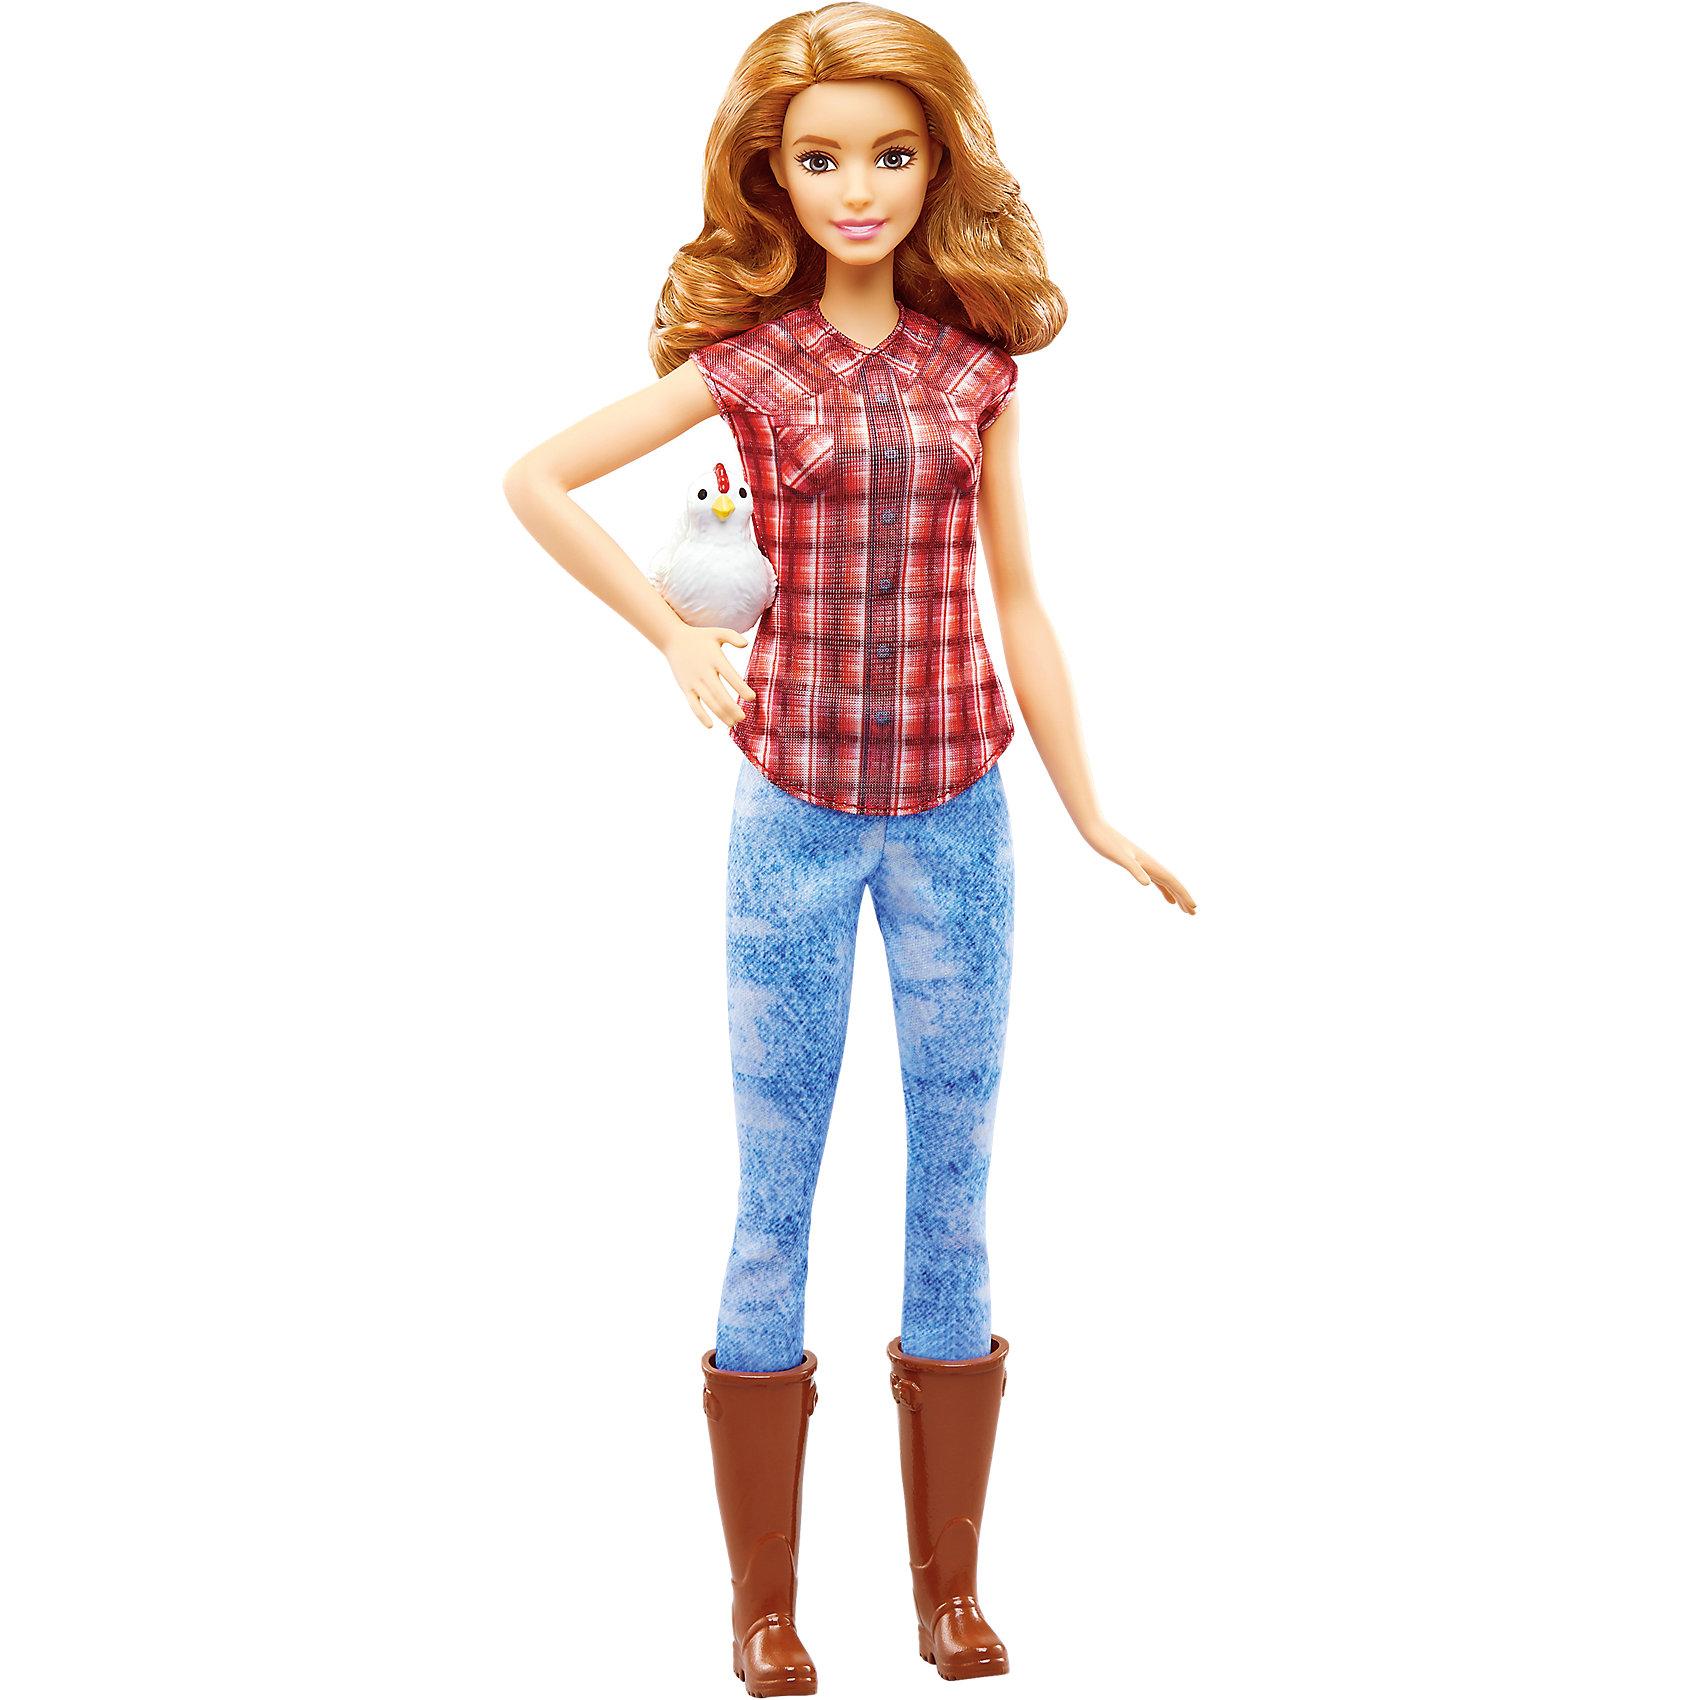 Кукла Фермер из серии  «Кем быть?», BarbieКуклы-модели<br><br><br>Ширина мм: 331<br>Глубина мм: 119<br>Высота мм: 40<br>Вес г: 200<br>Возраст от месяцев: 36<br>Возраст до месяцев: 72<br>Пол: Женский<br>Возраст: Детский<br>SKU: 5089090